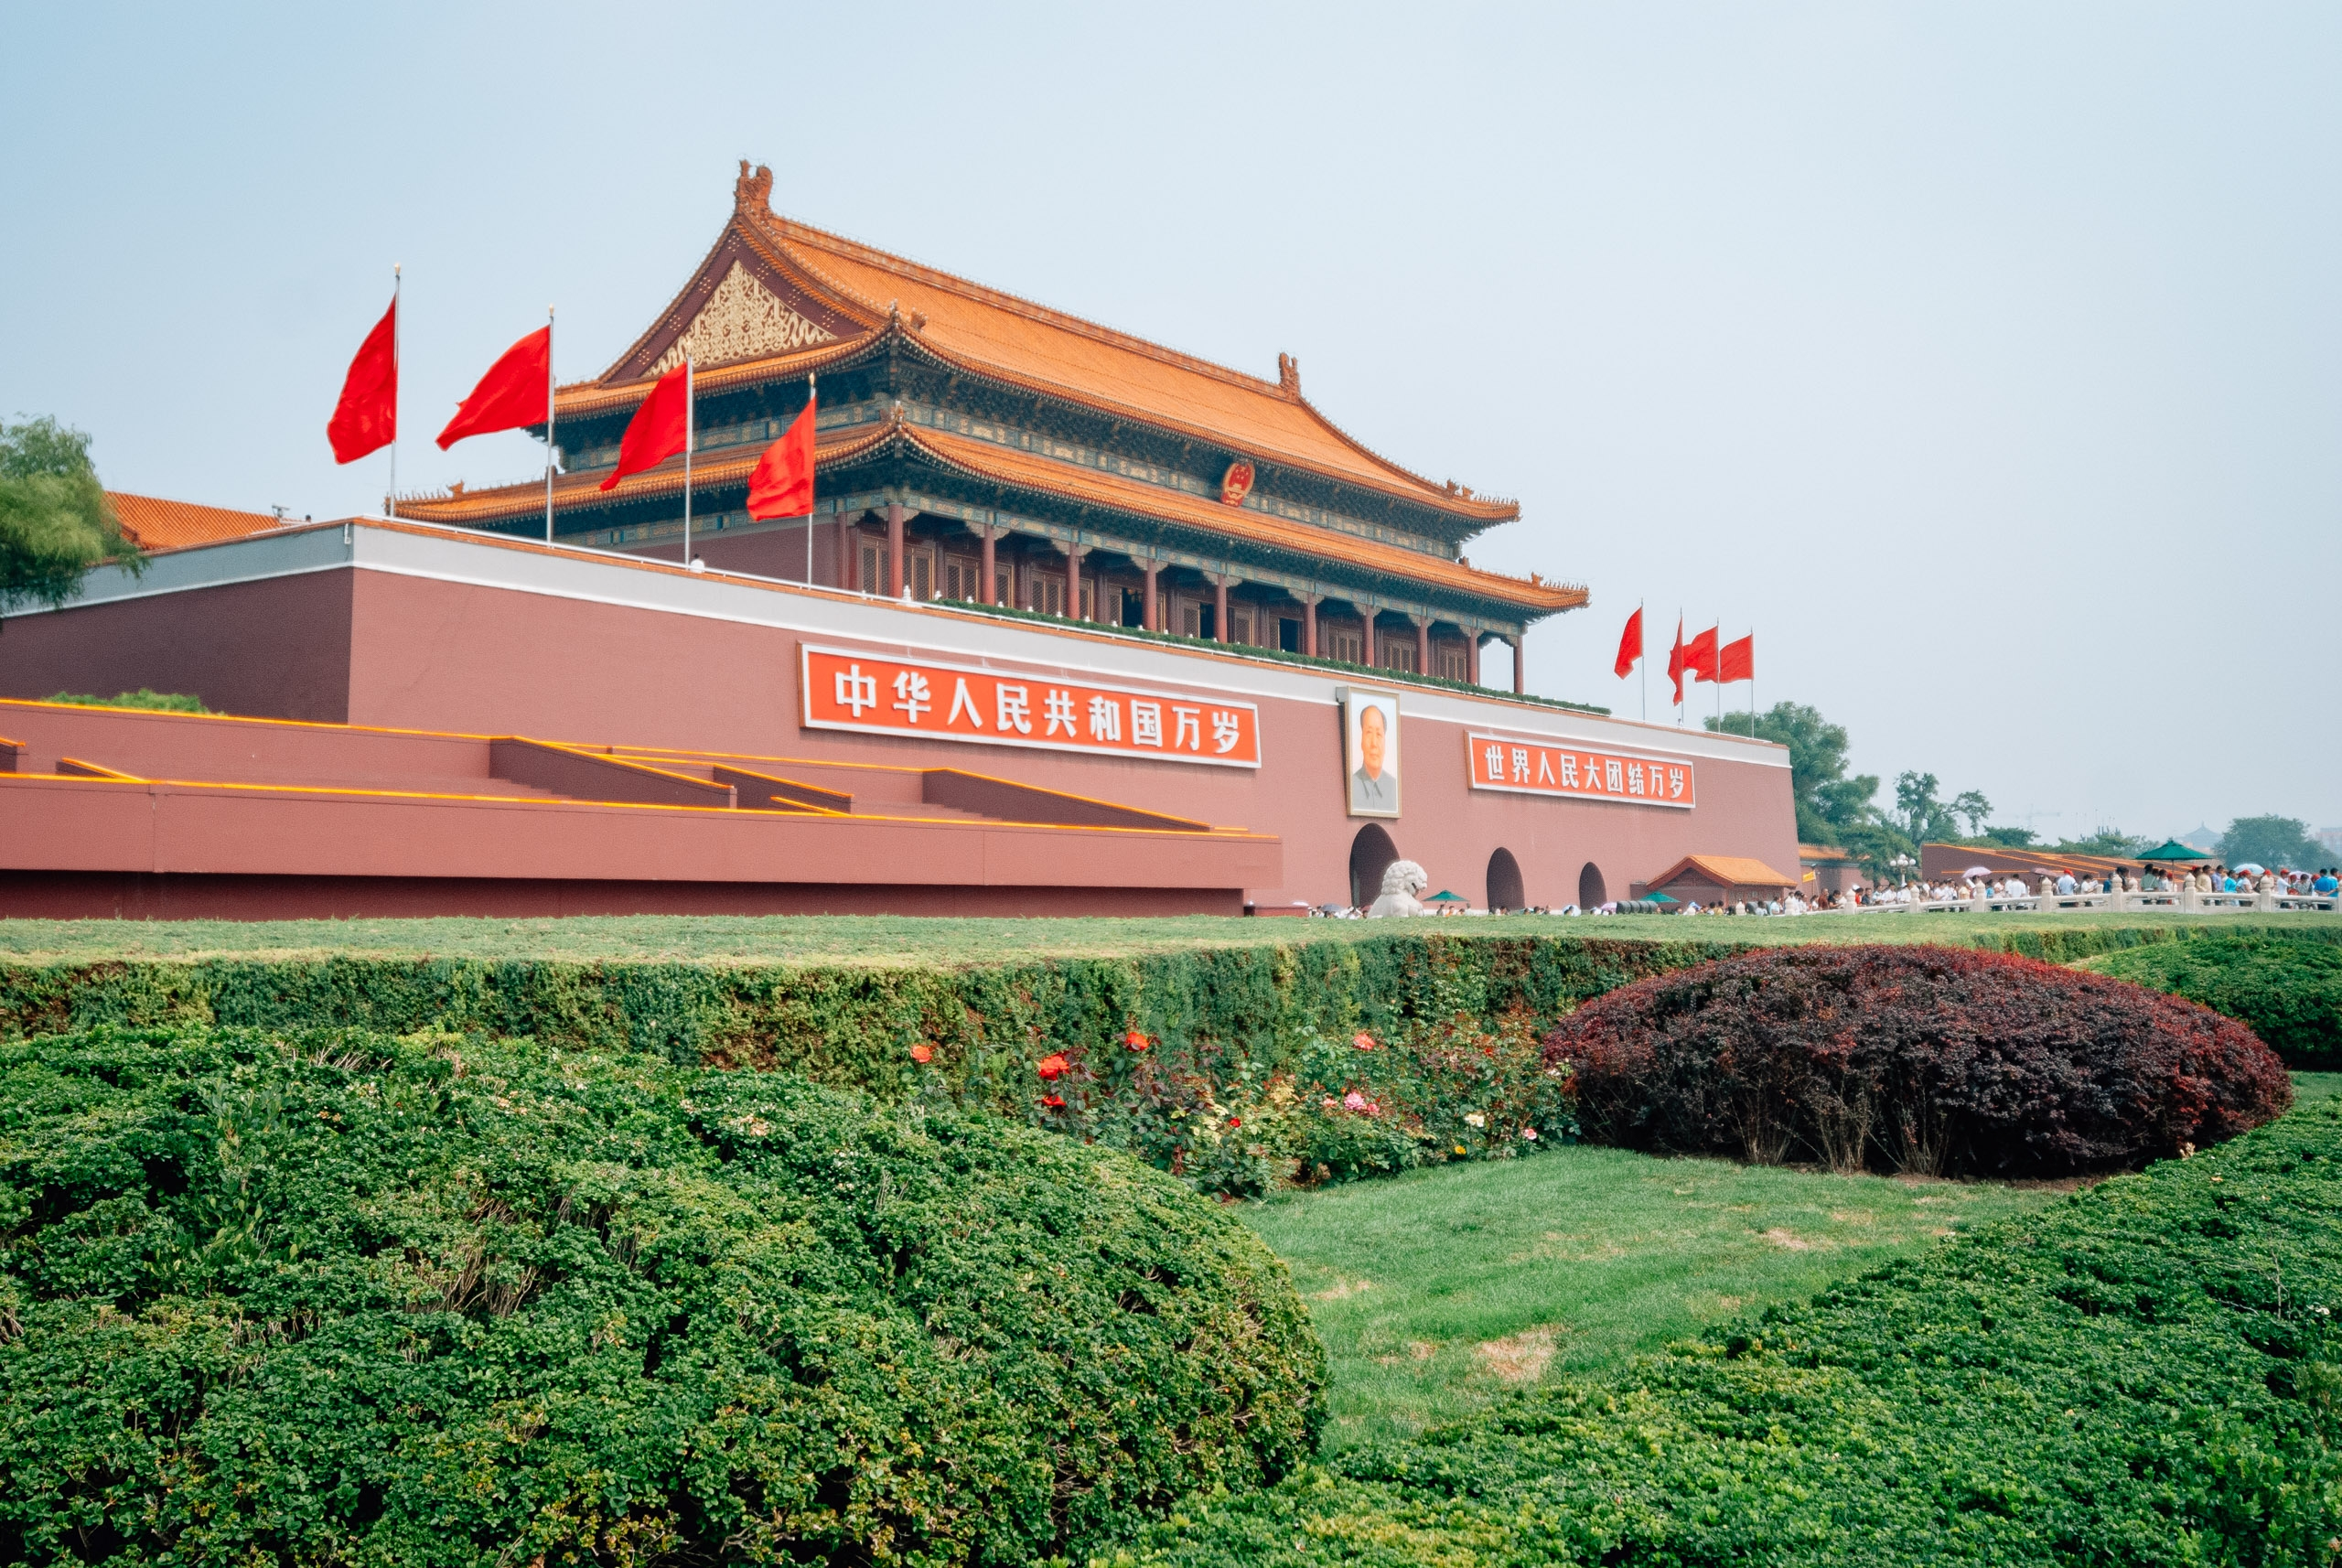 China - Beijing & The Great Wall - 2010-0903-DSC_0295_46960